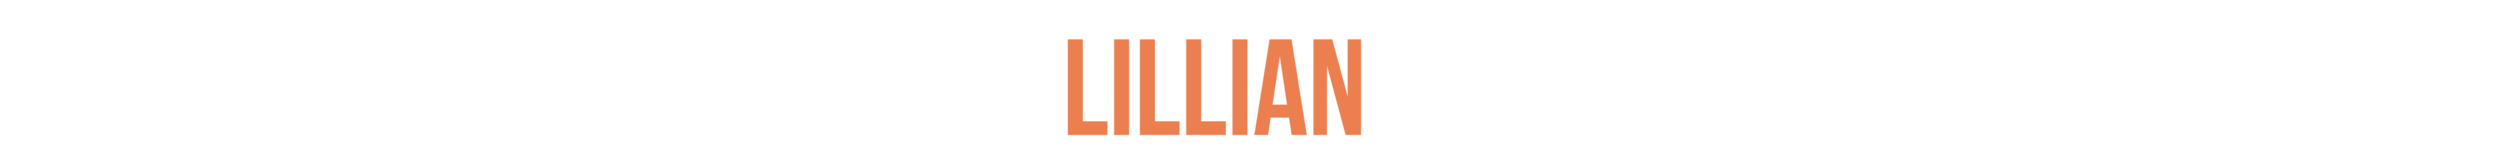 lillian_tuli_portrait